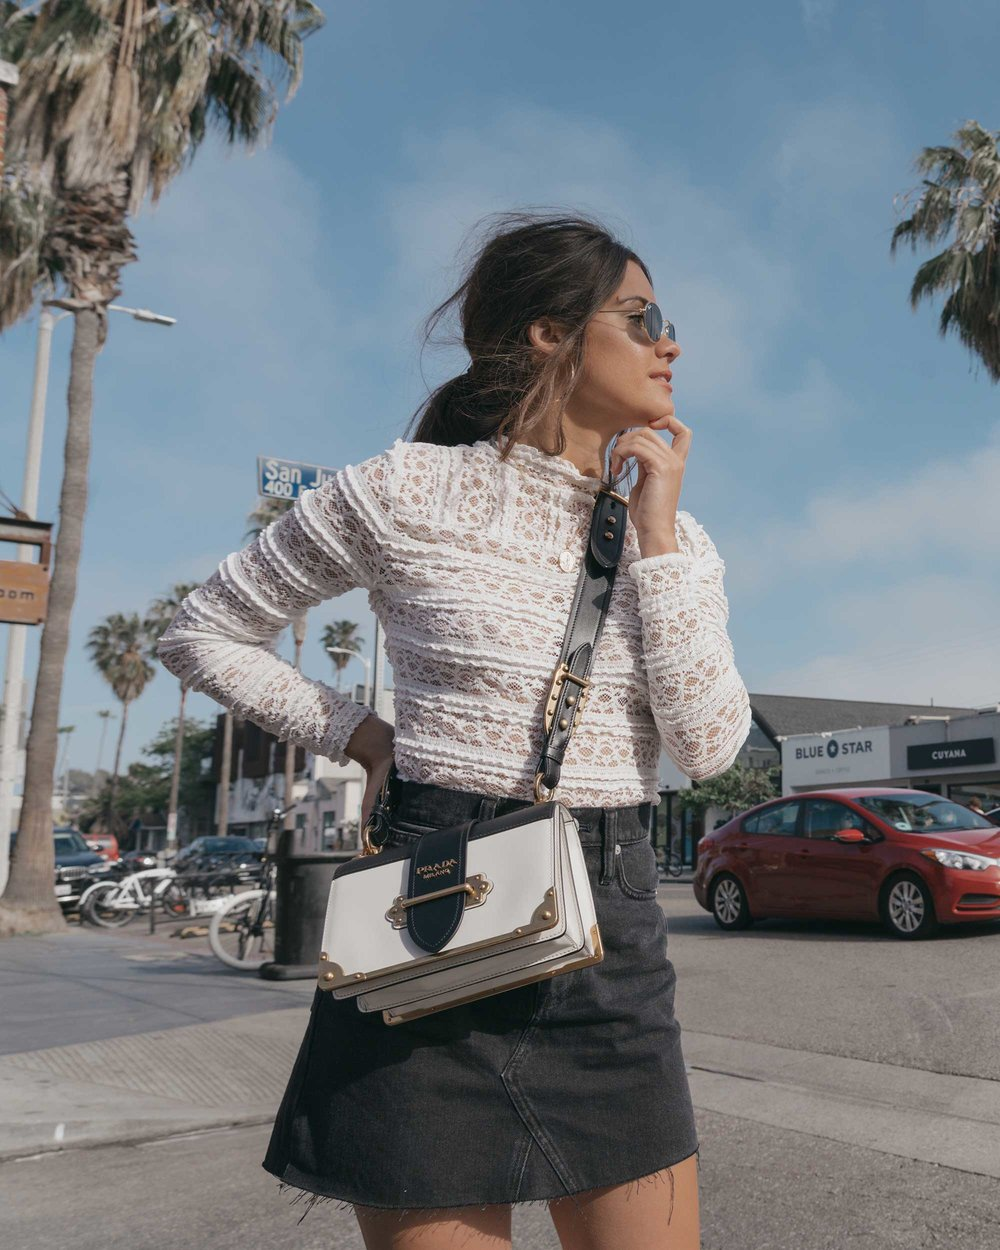 Prada City Saffiano Leather Cahier Bag, Black Denim Skirt, Summer outfit, Abbot Kinney California10.jpg